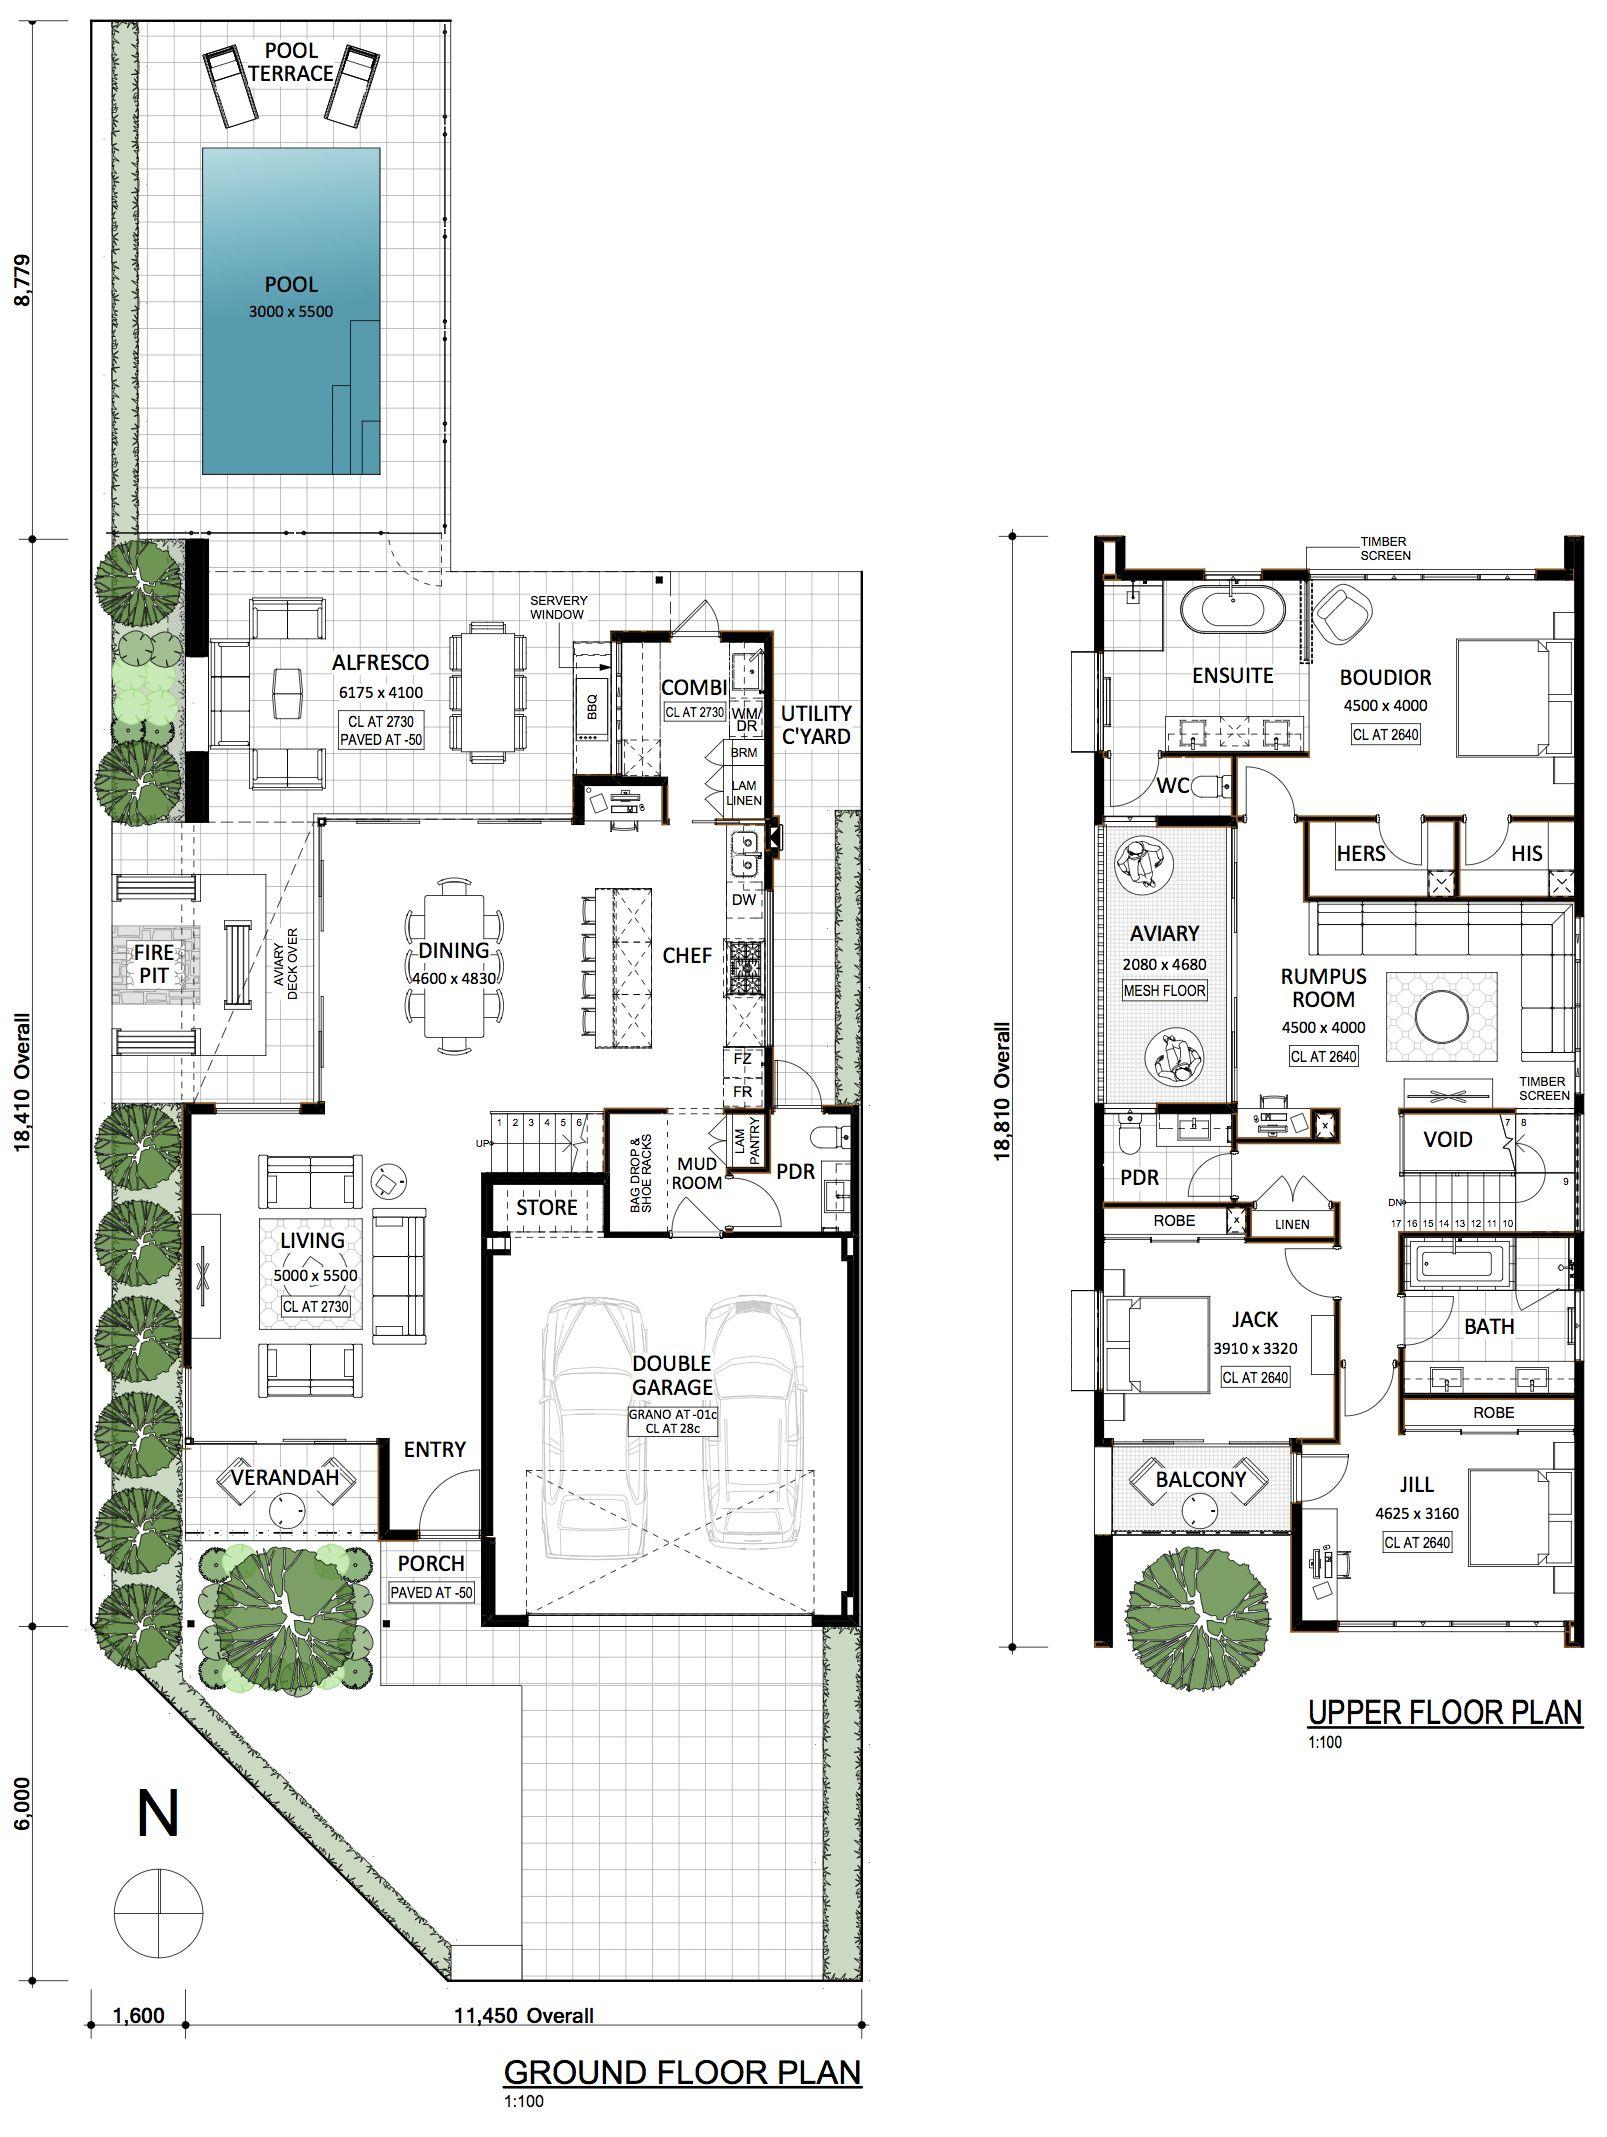 Barnhaus Residential Attitudes Home Design Floor Plans House Plans Australia Floor Plan Design